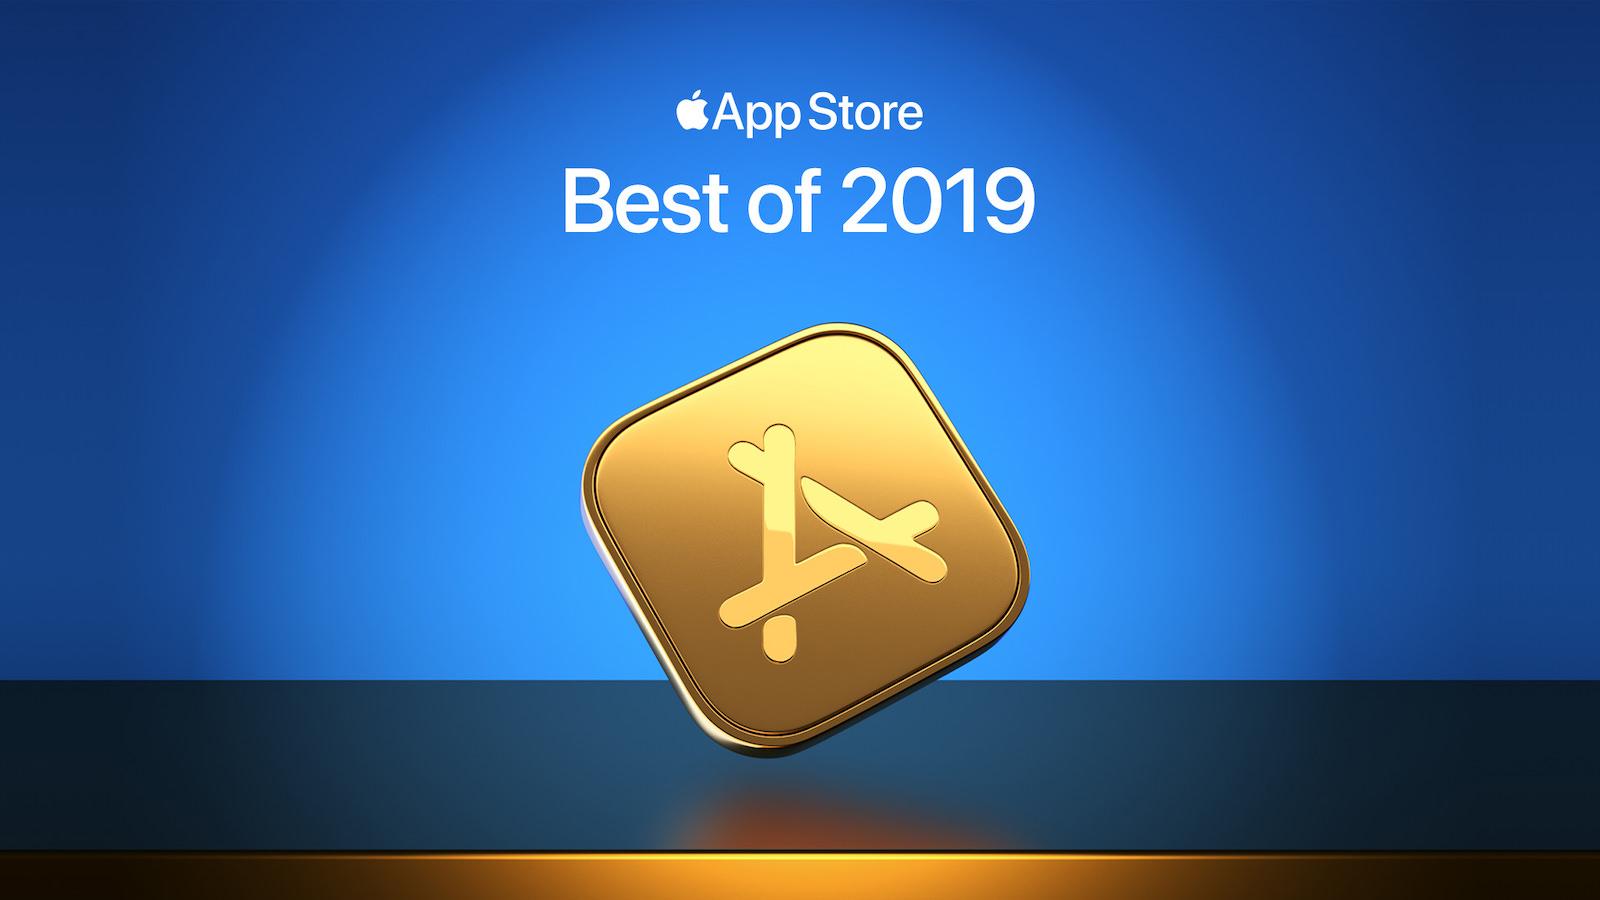 Apple_Best-of-2019_Best-Apps-Games_120219.jpg